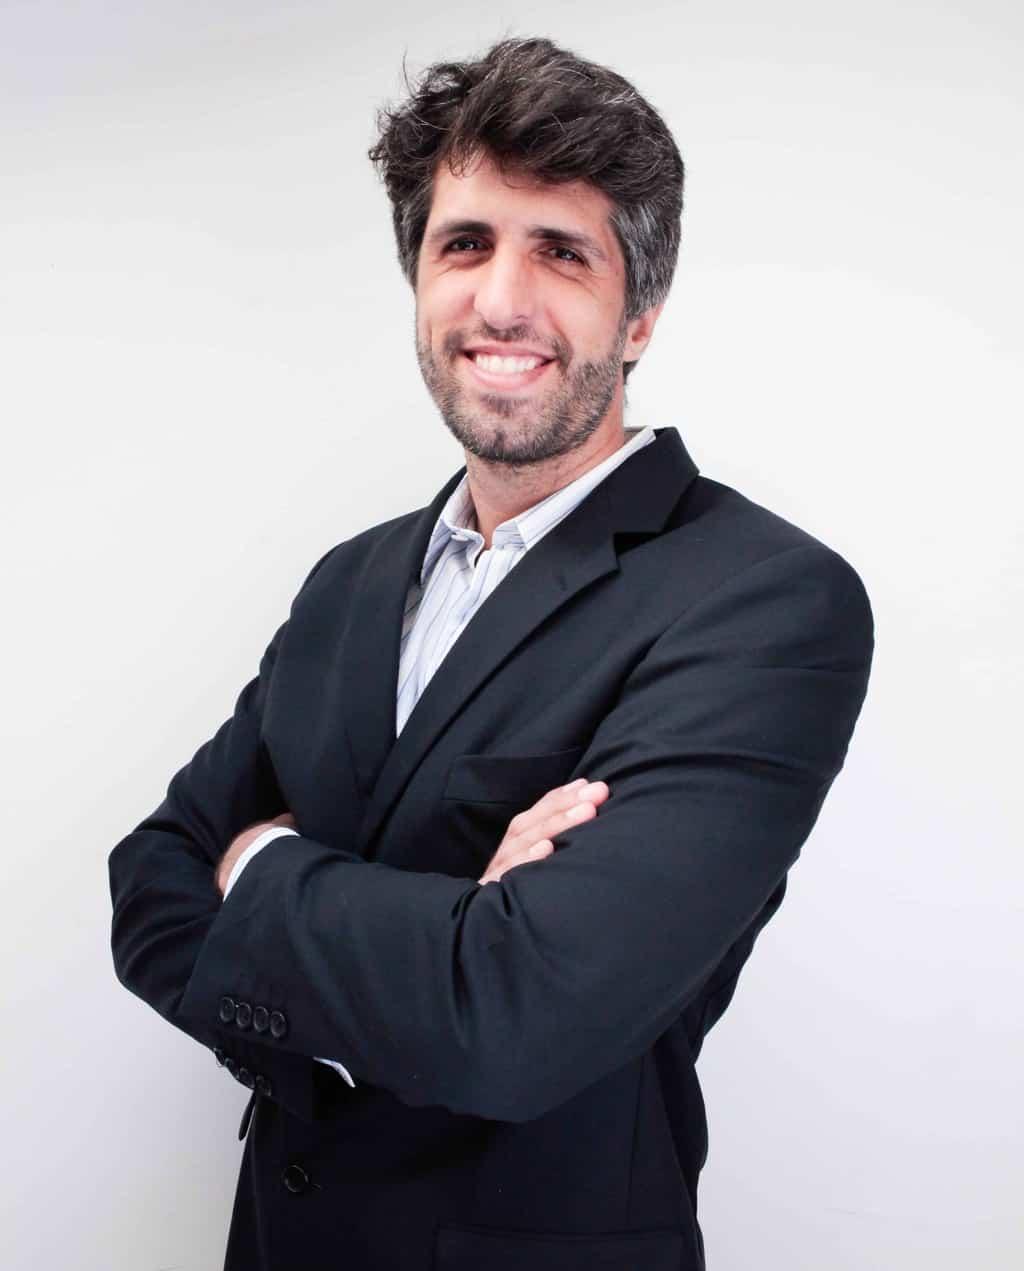 Pedro Mendes Succar